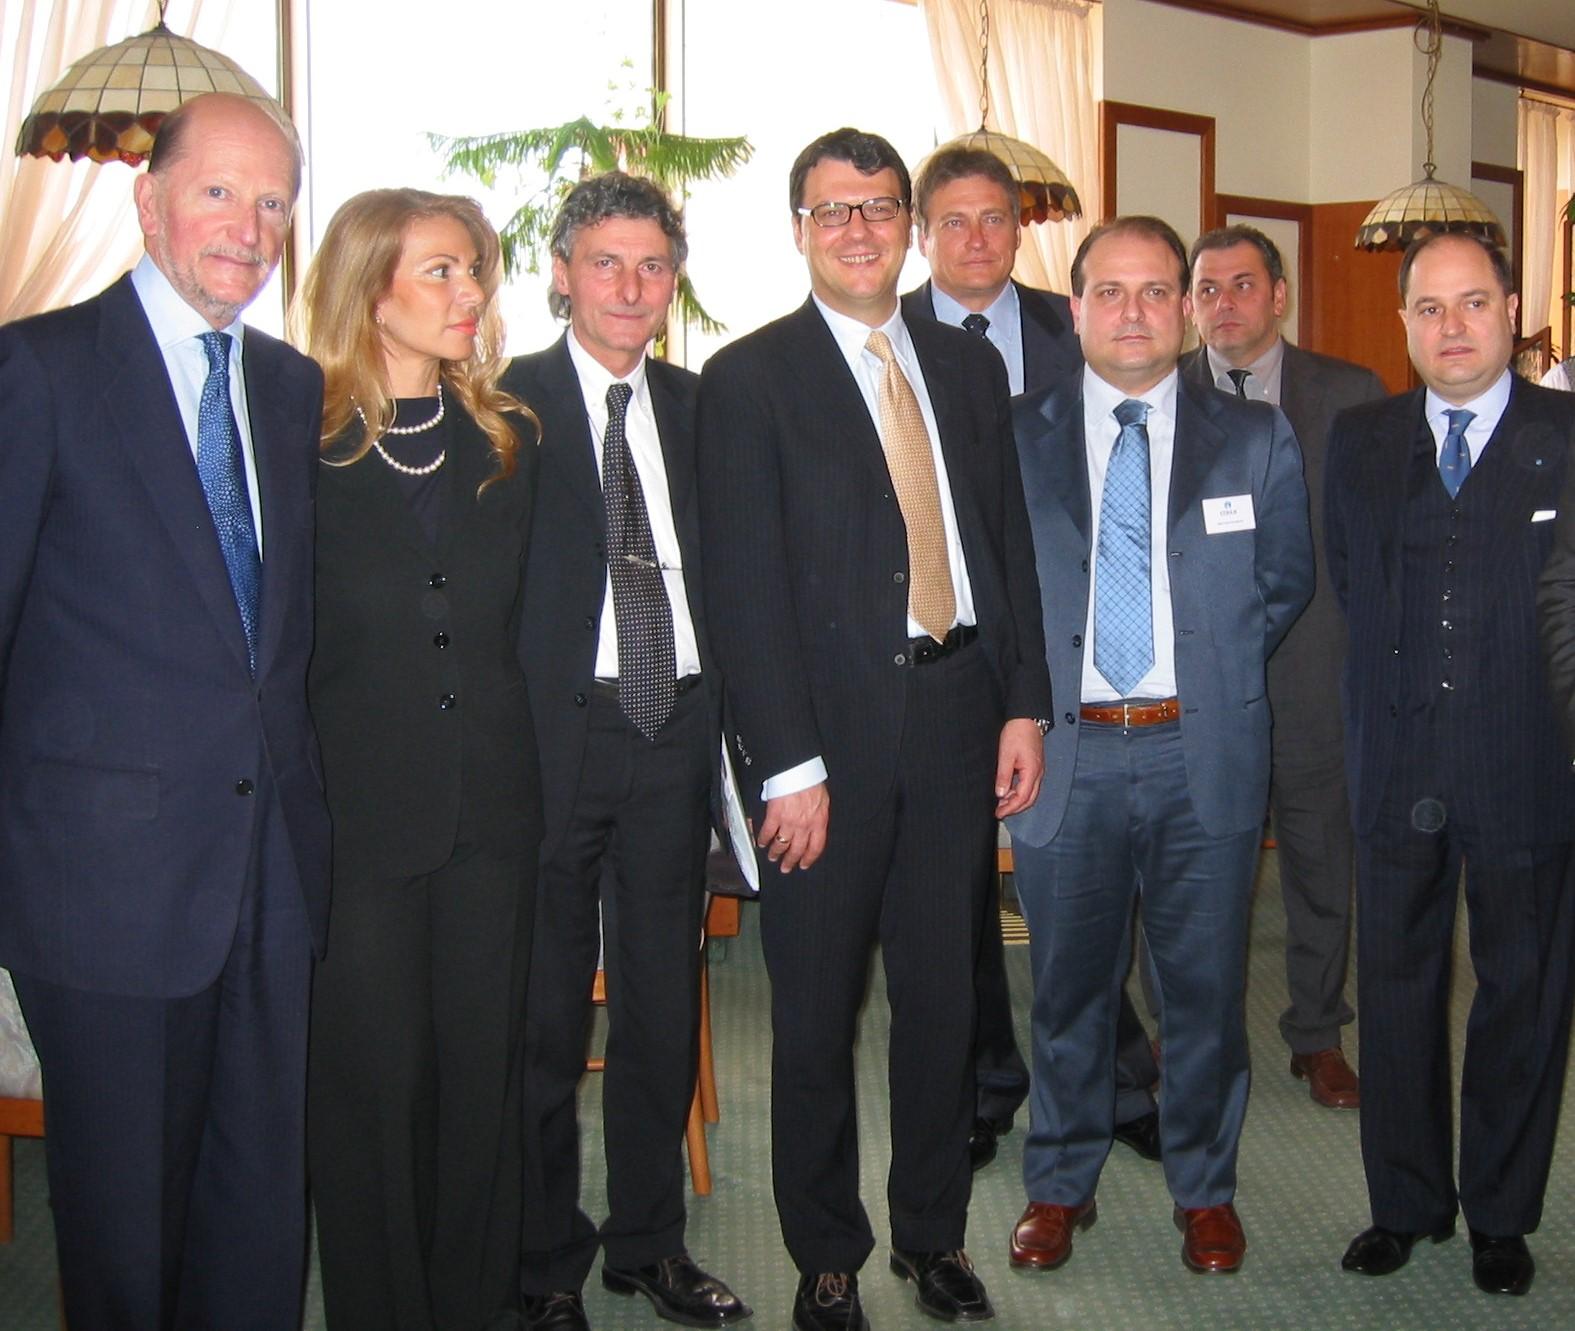 MISSIONE BULGARIA 2003